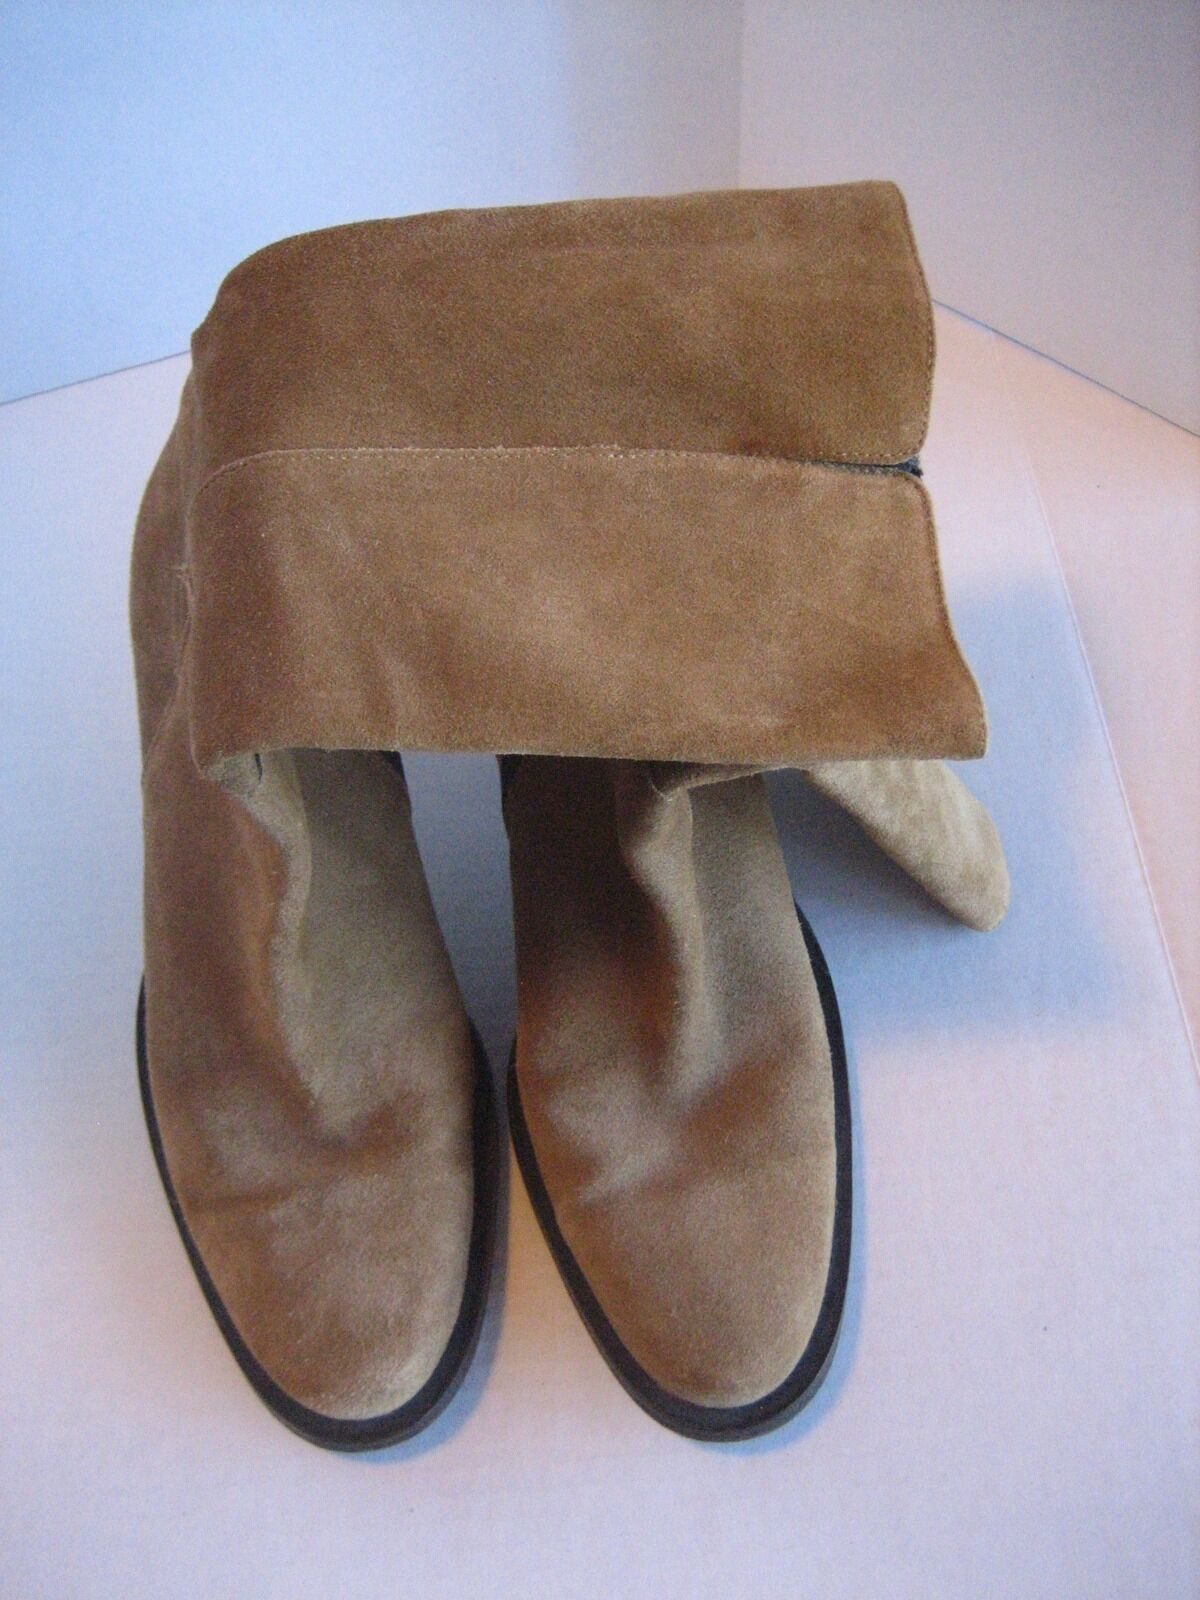 Banana Republic Women's Tan Suede Mid Calif inside Zipper Boots Sz 8 Pre-Owned